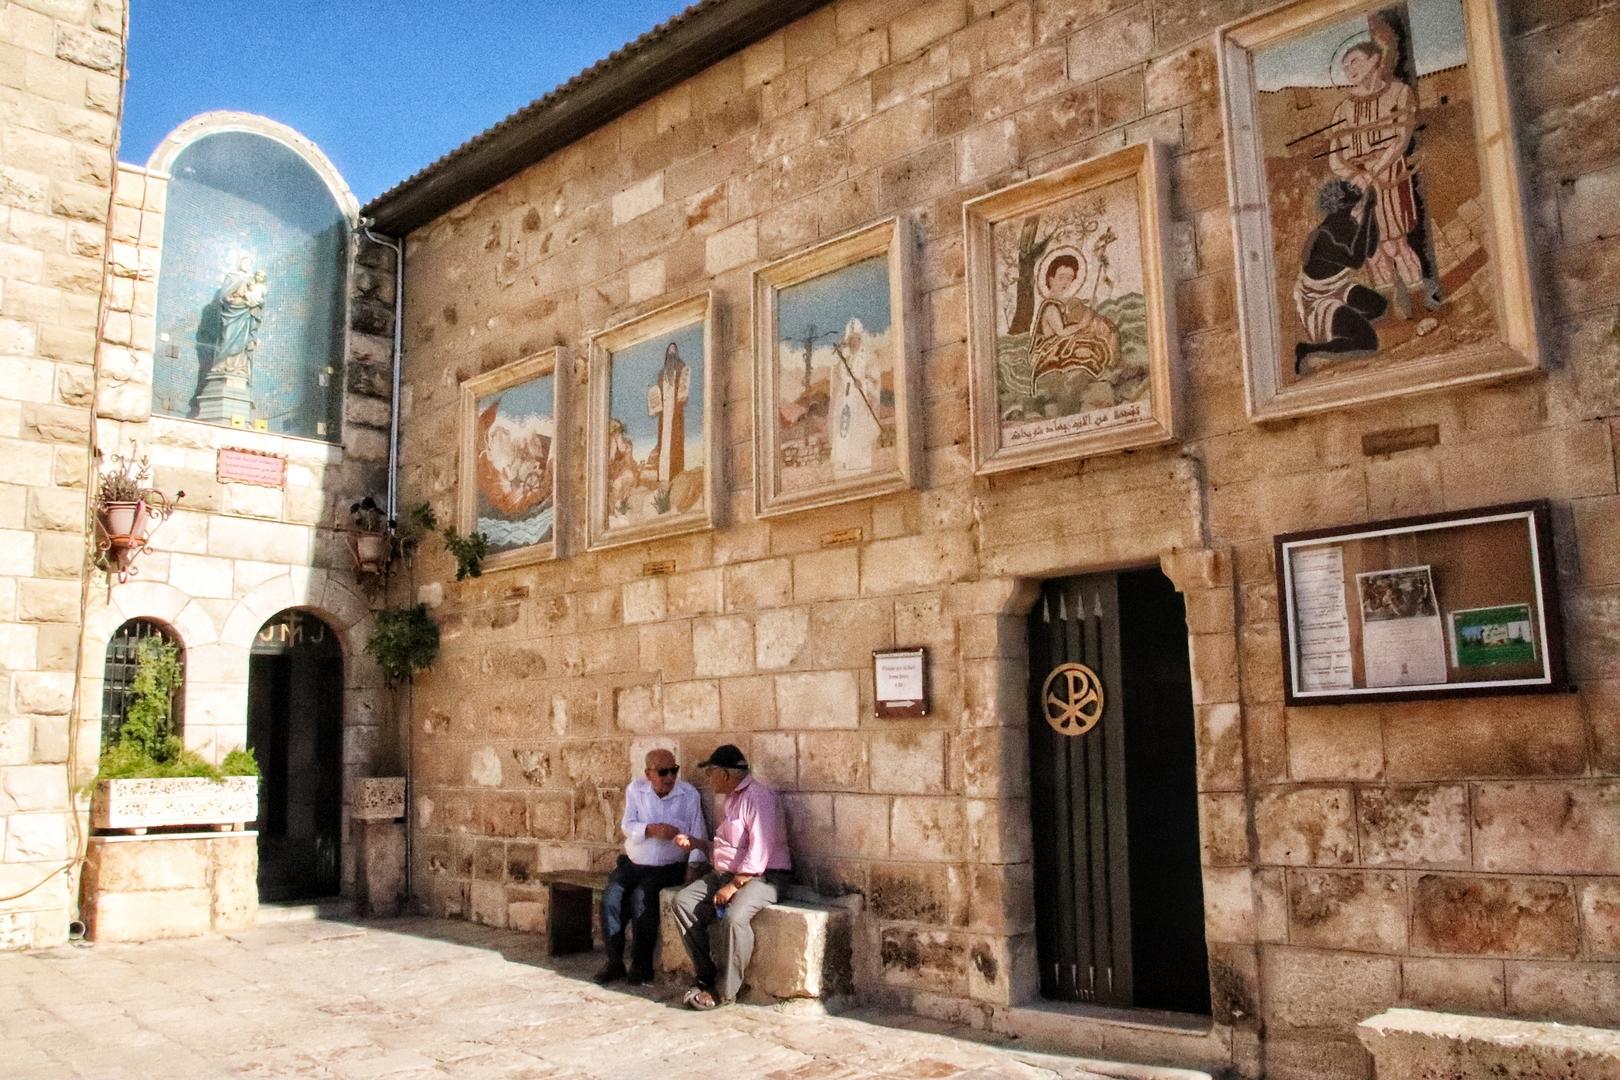 Jordanie - Eglise Saint Jean Baptiste à Madaba